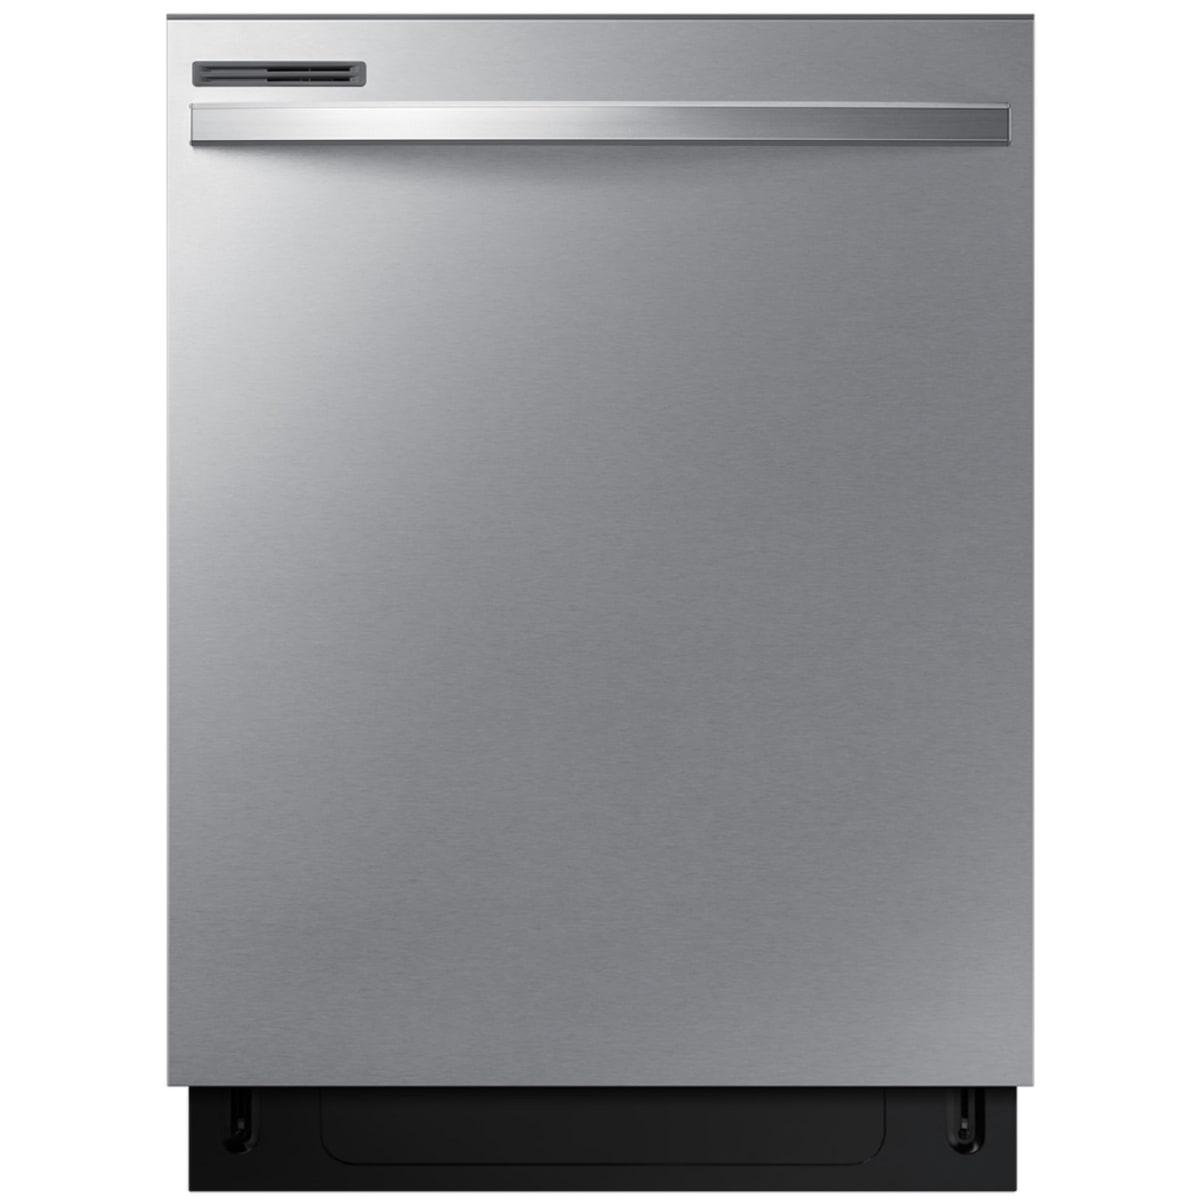 Samsung Dishwasher Dishwashers Dw80r2031